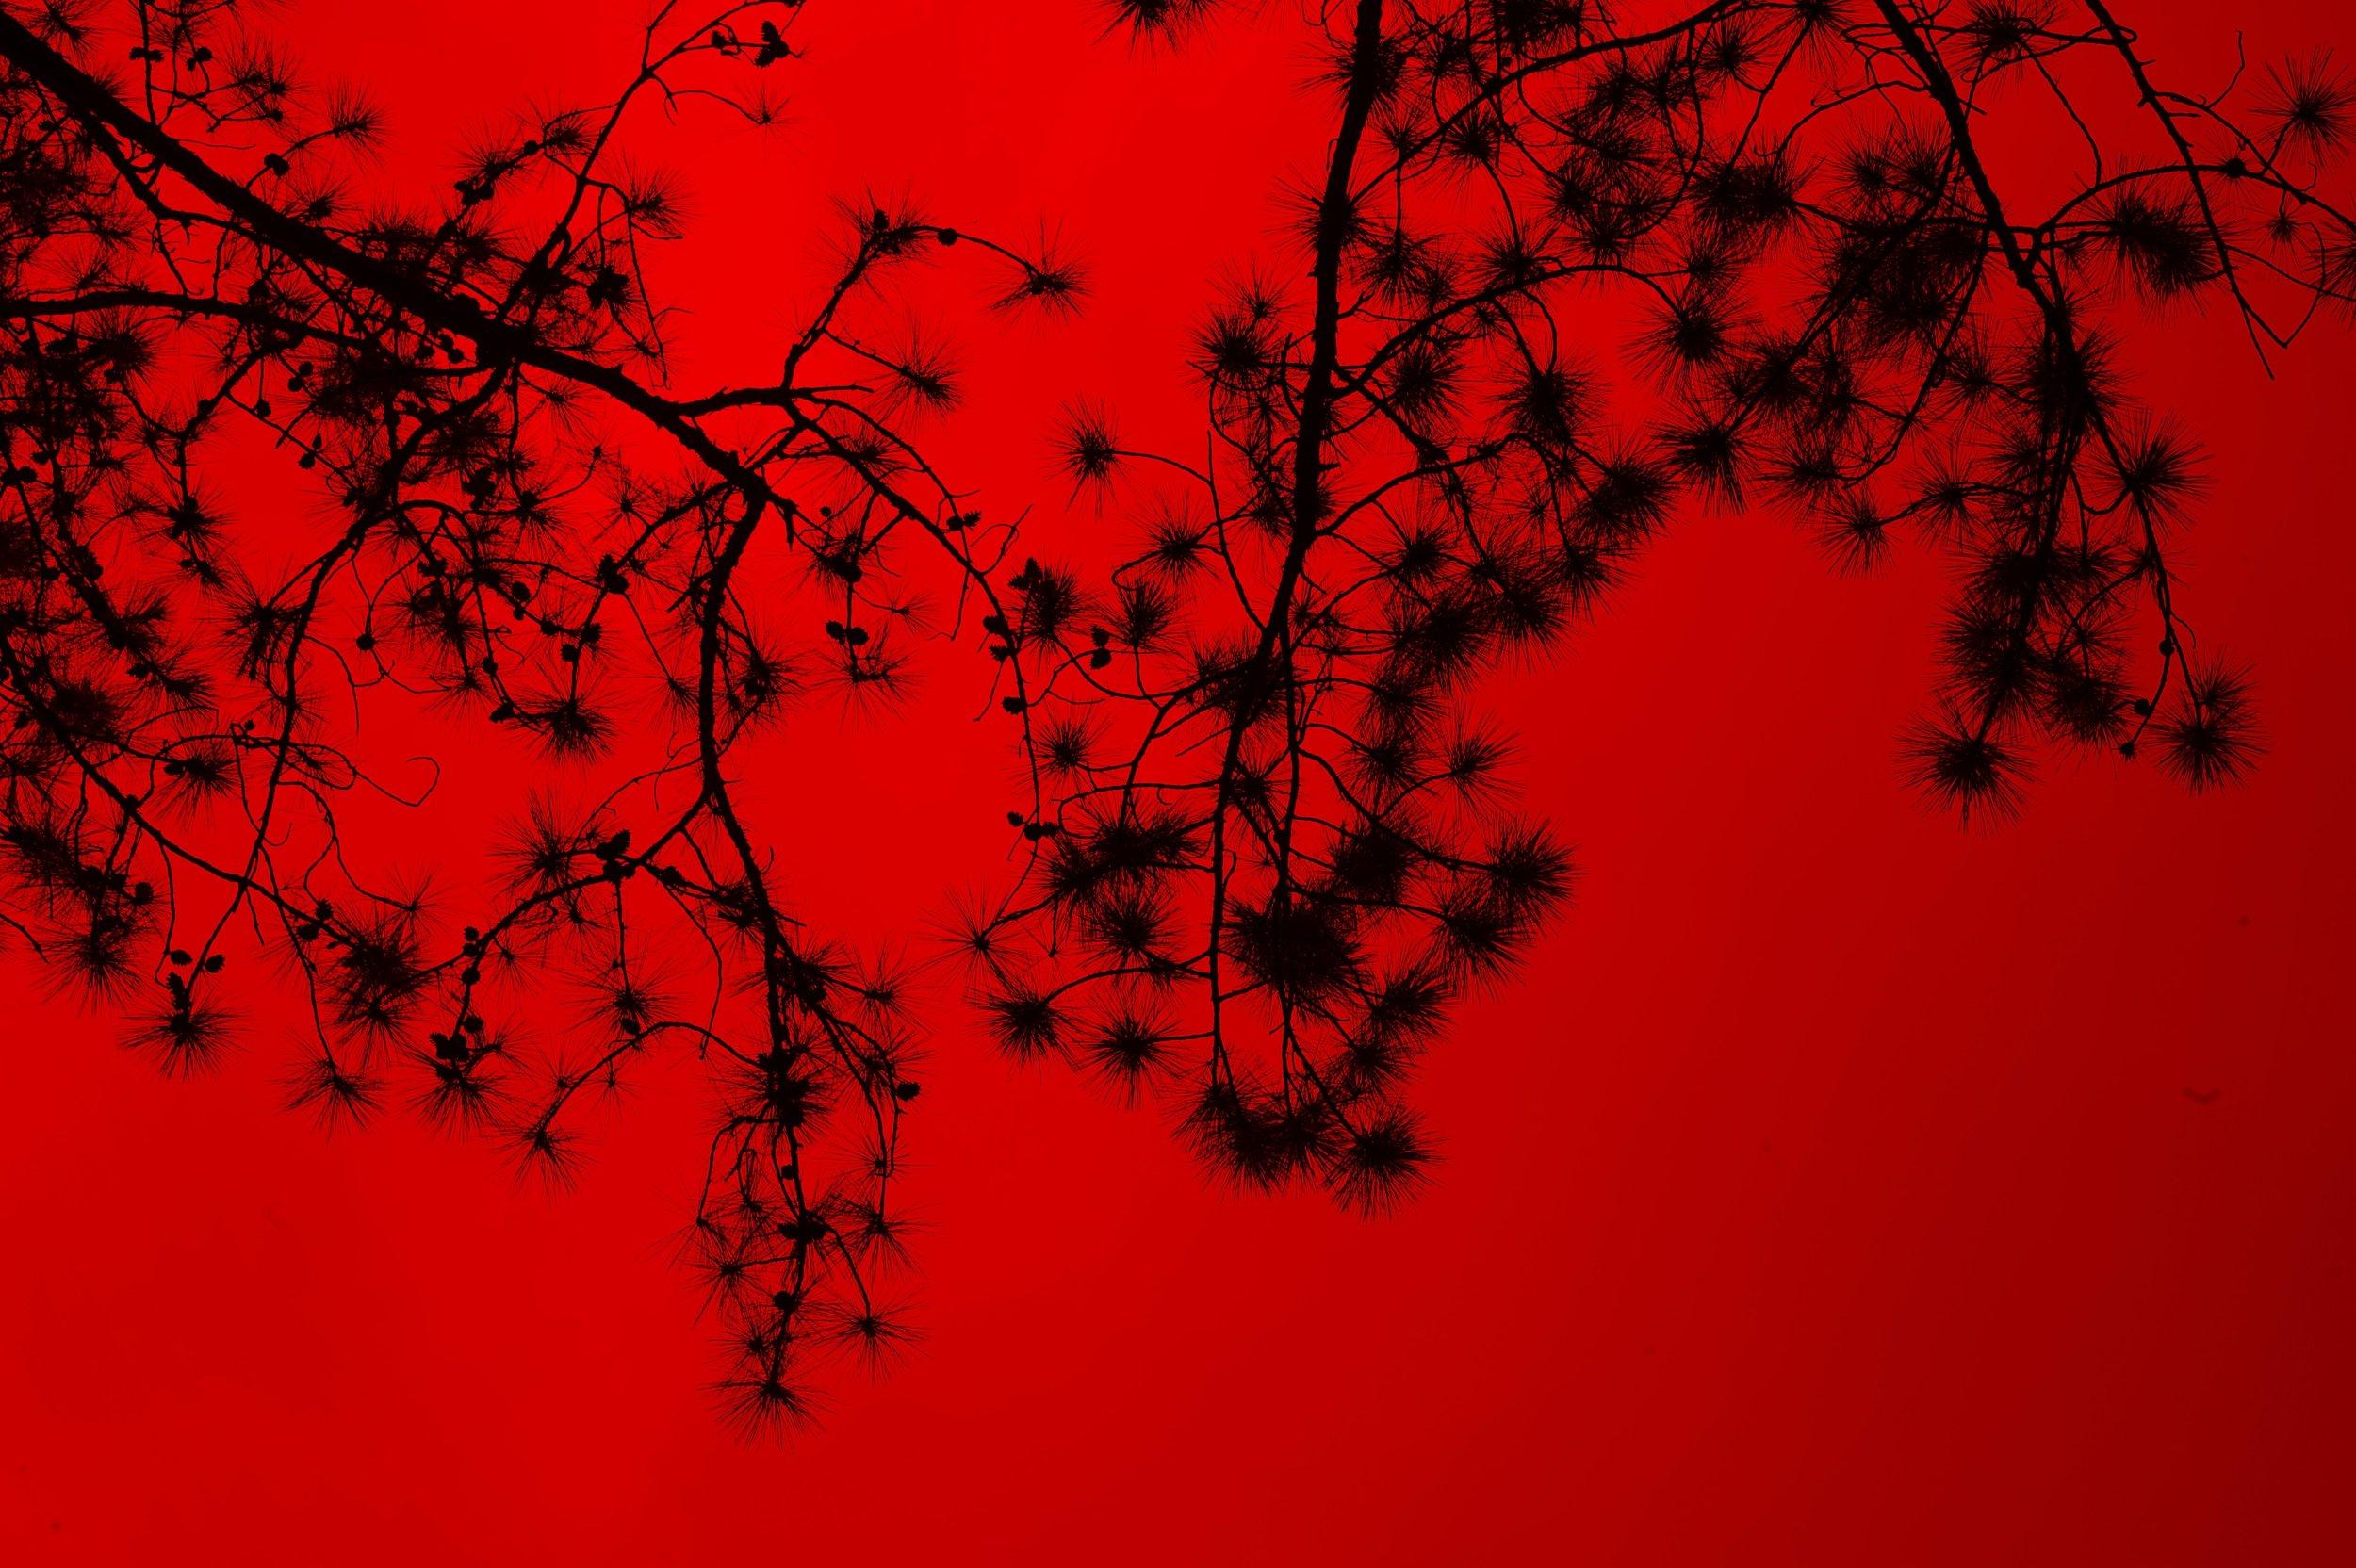 red-network.jpeg